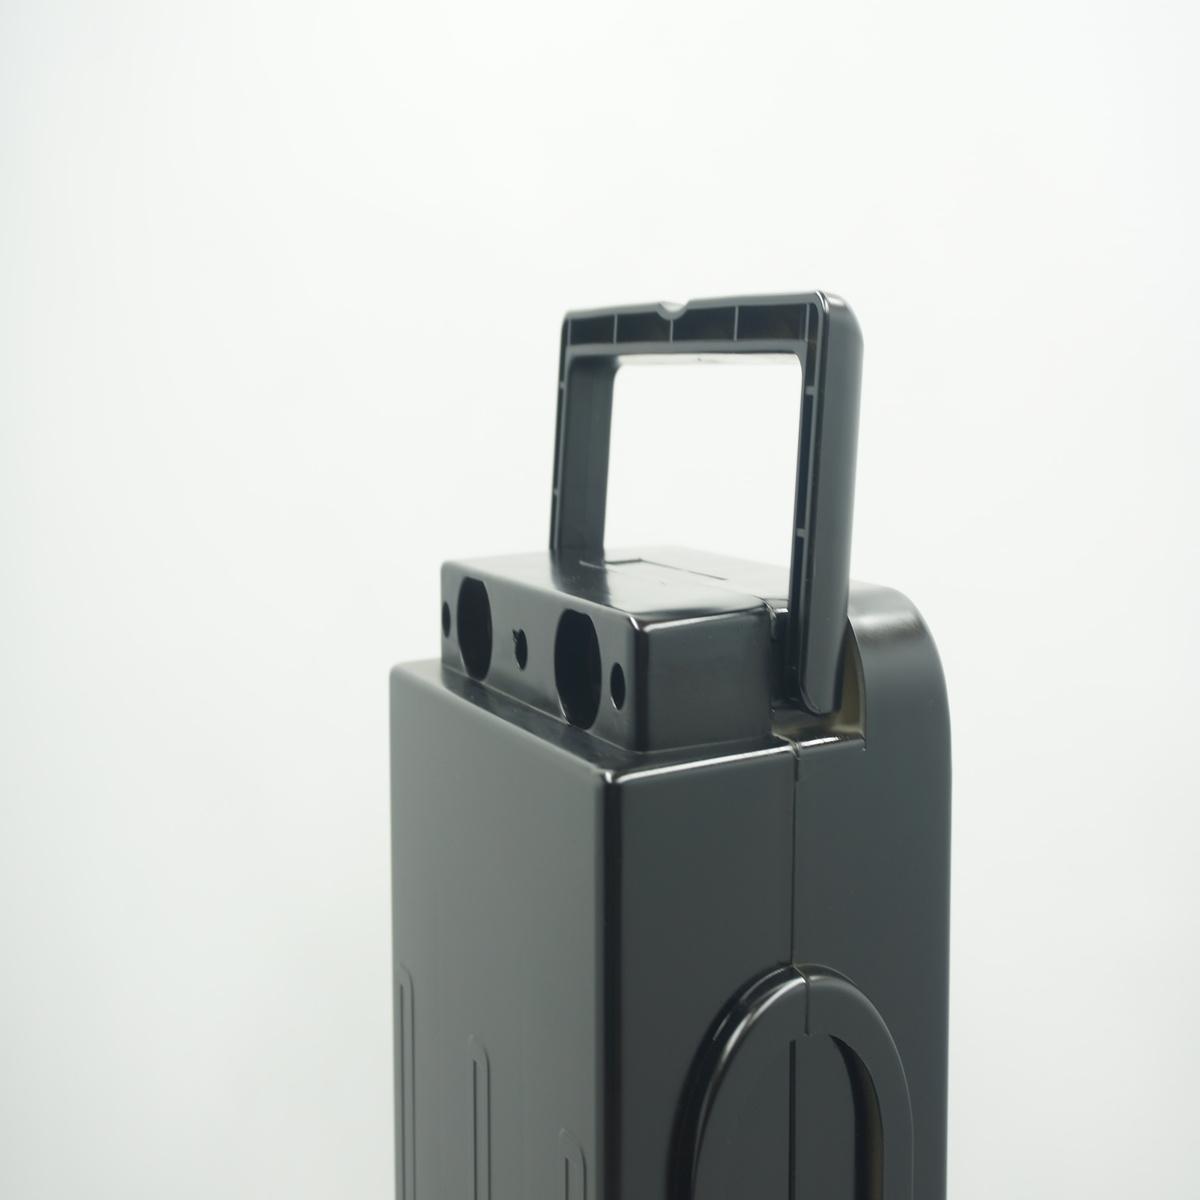 Caixa de Bateria MAXX (S/Componentes)